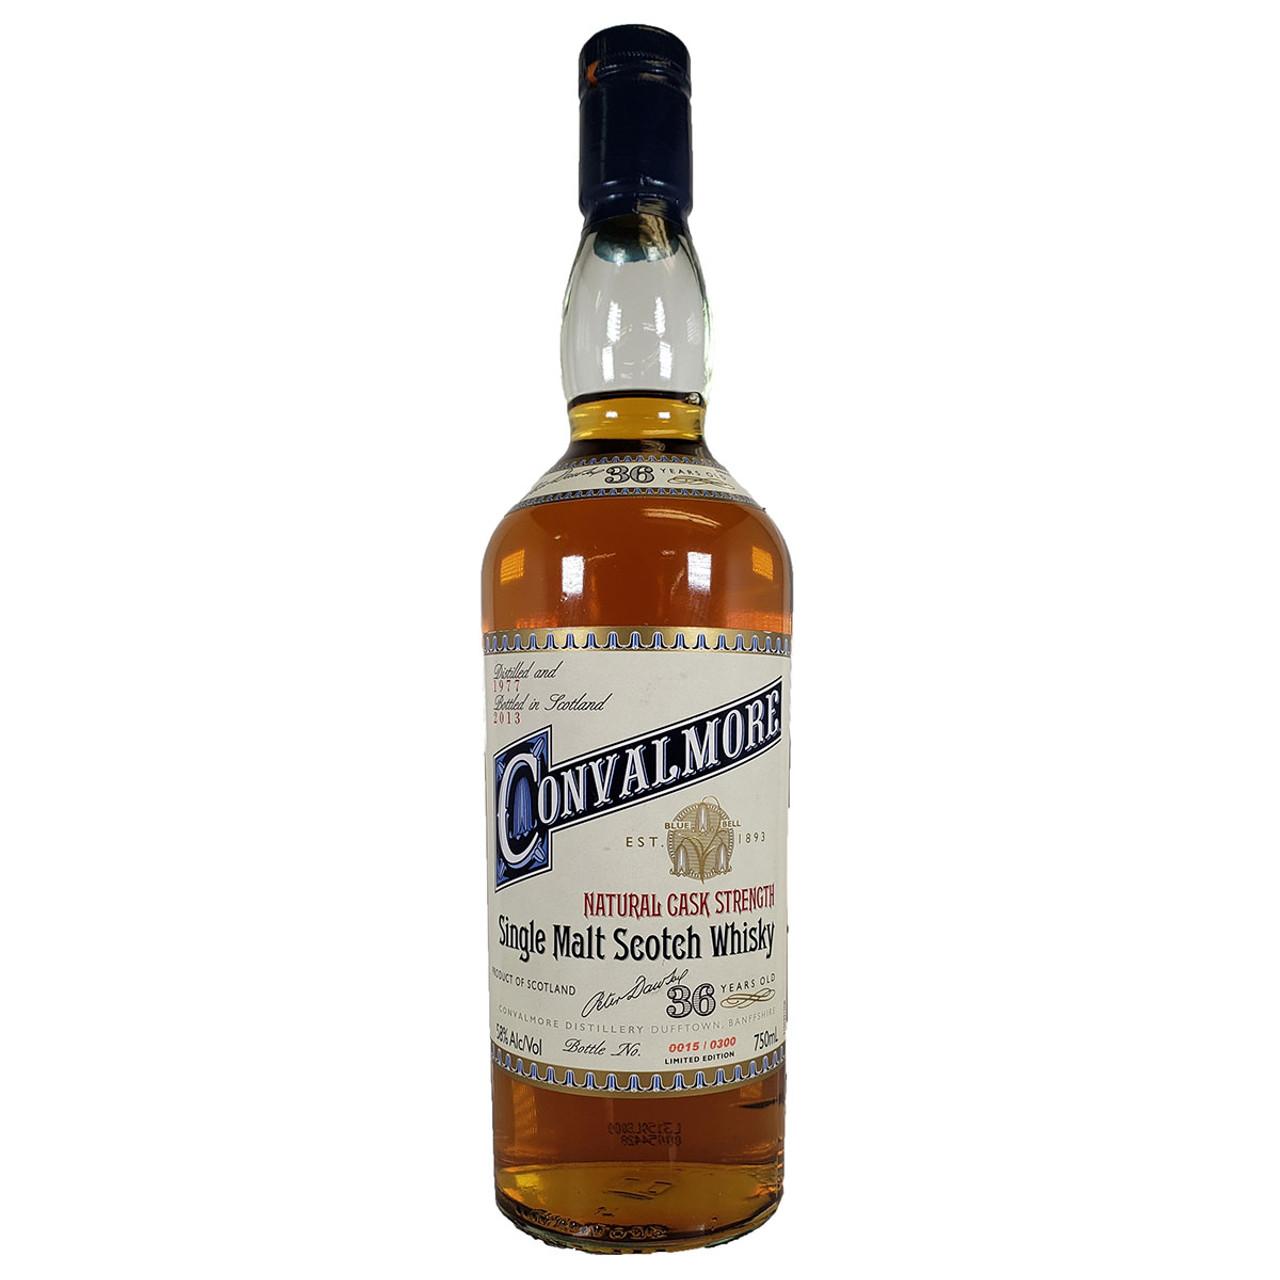 Convalmore 36 Year Old Single Malt Scotch Whisky Holiday Wine Cellar